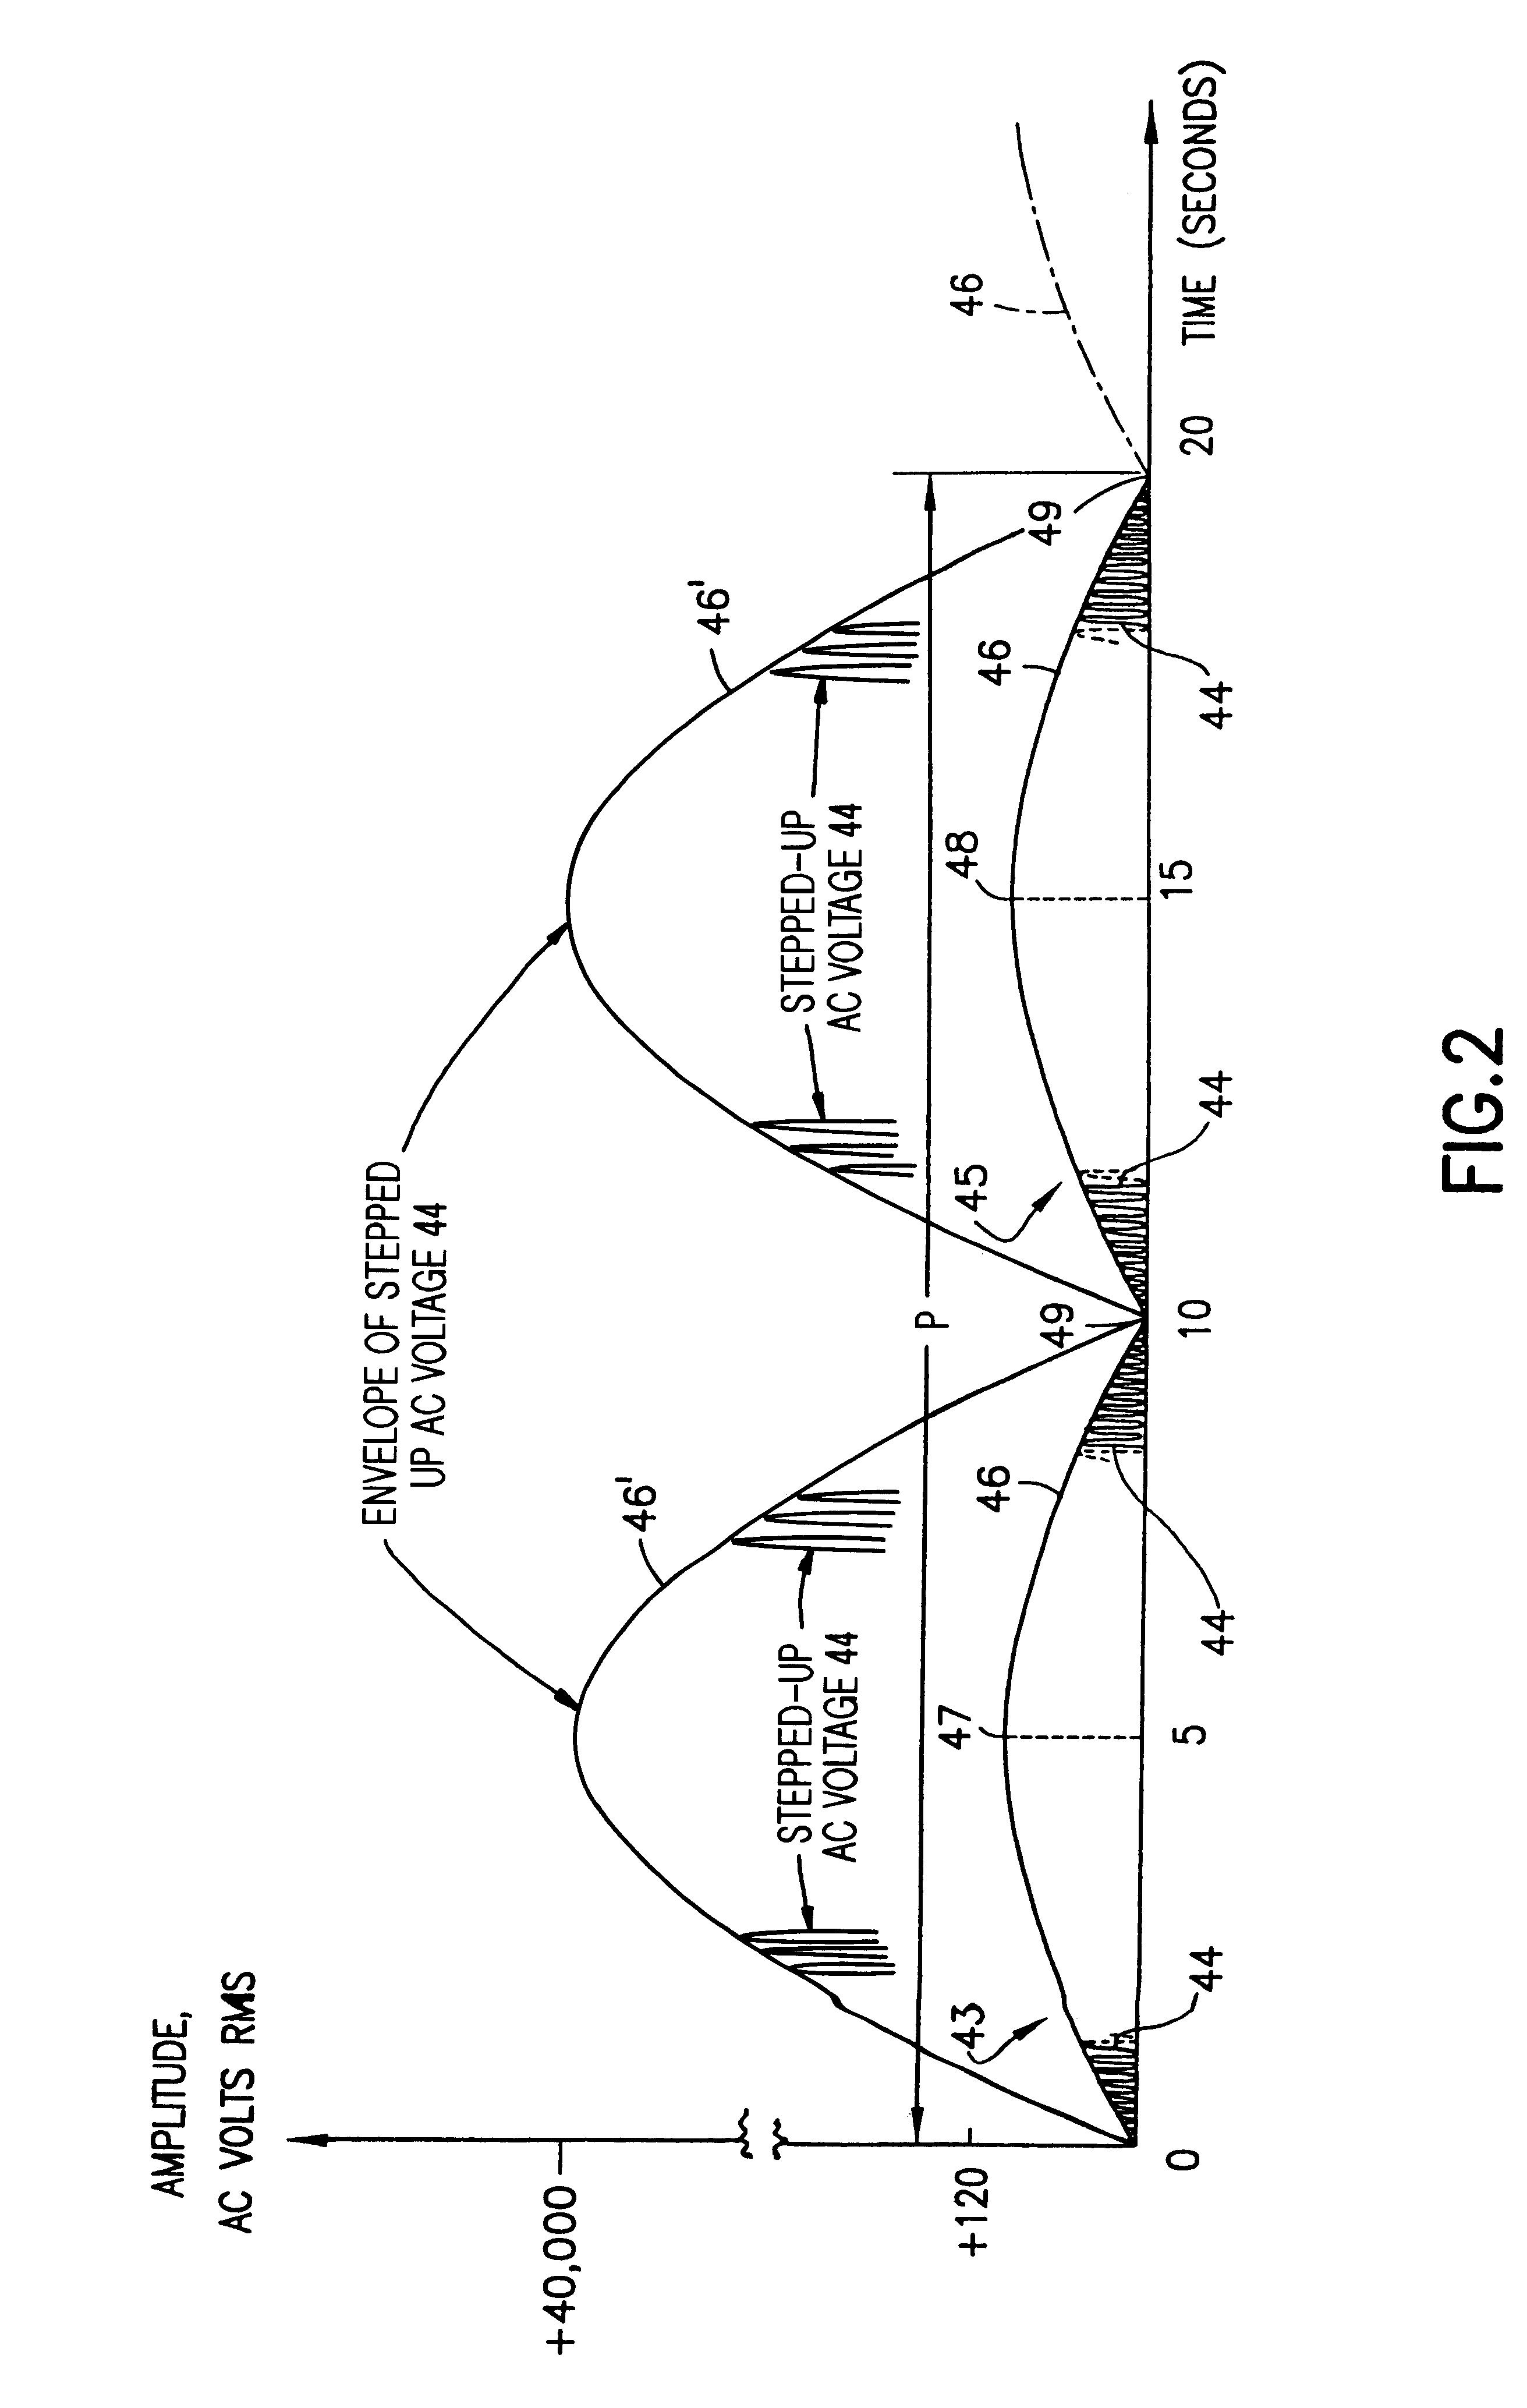 Variable Transformer Wiring Diagram Residential Wiring Diagrams ...